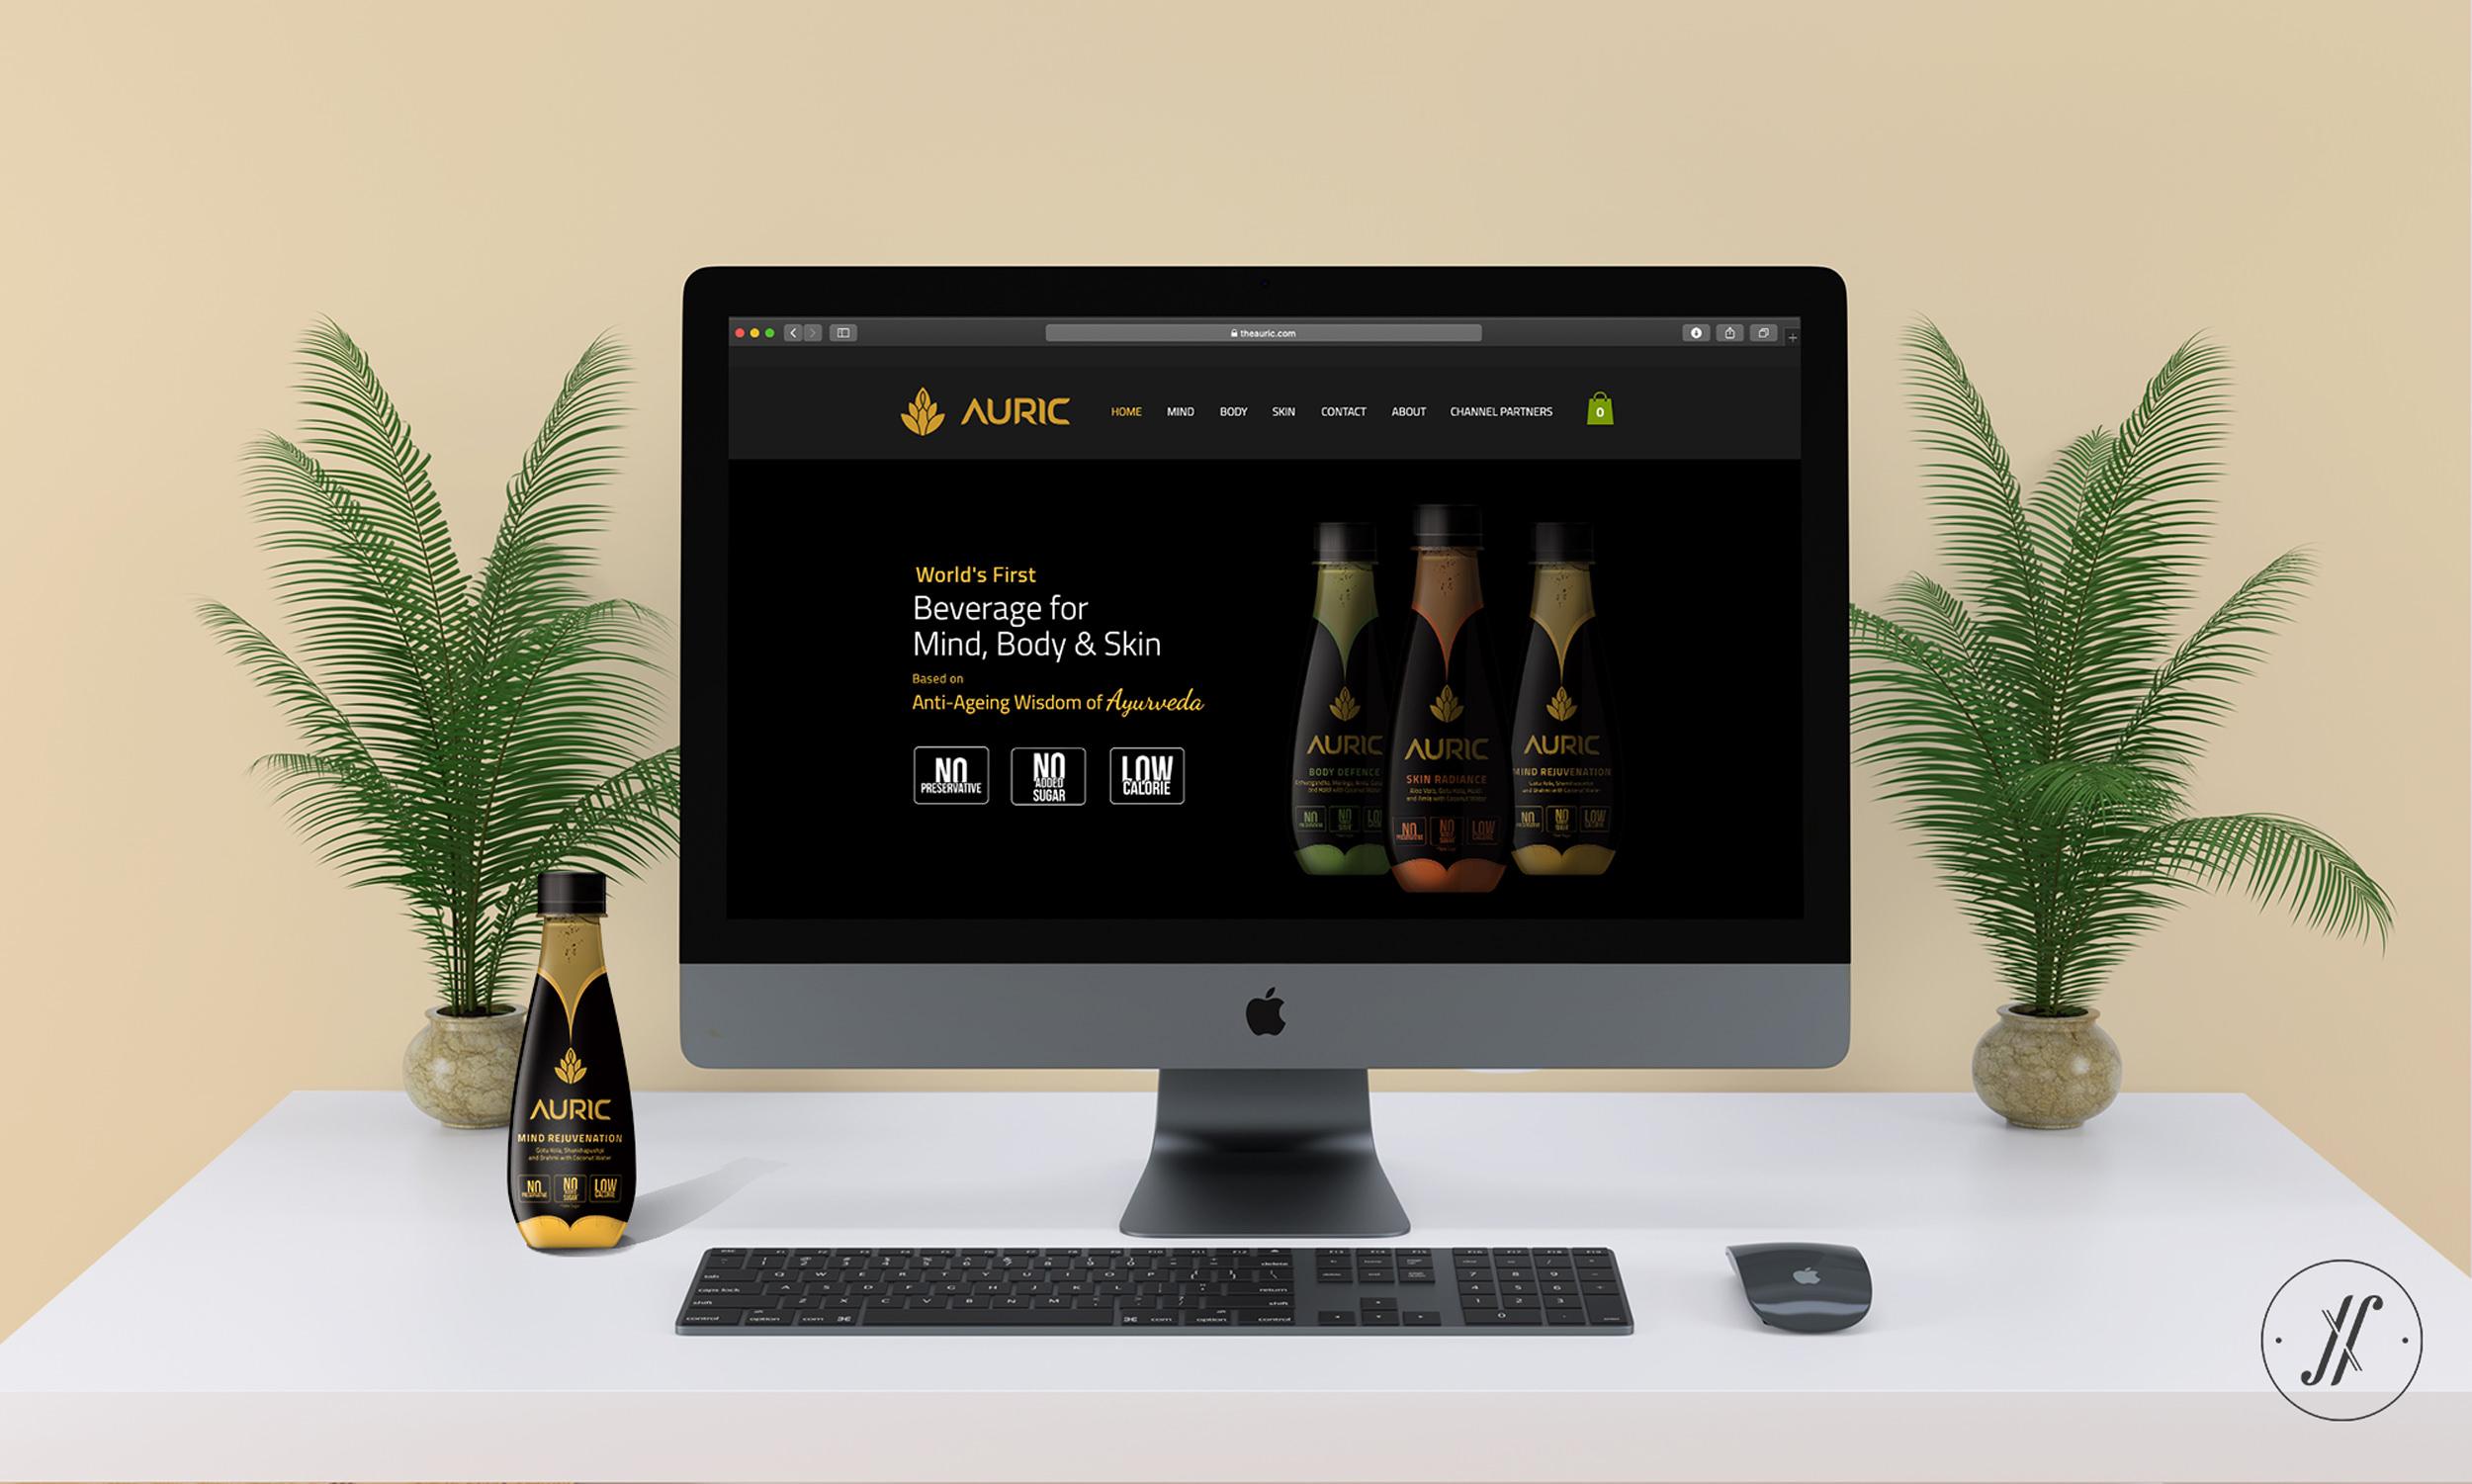 Yellow Fishes Branding Agency Mumbai Best creative branding strategy and brand design agency mumbai Auric website design